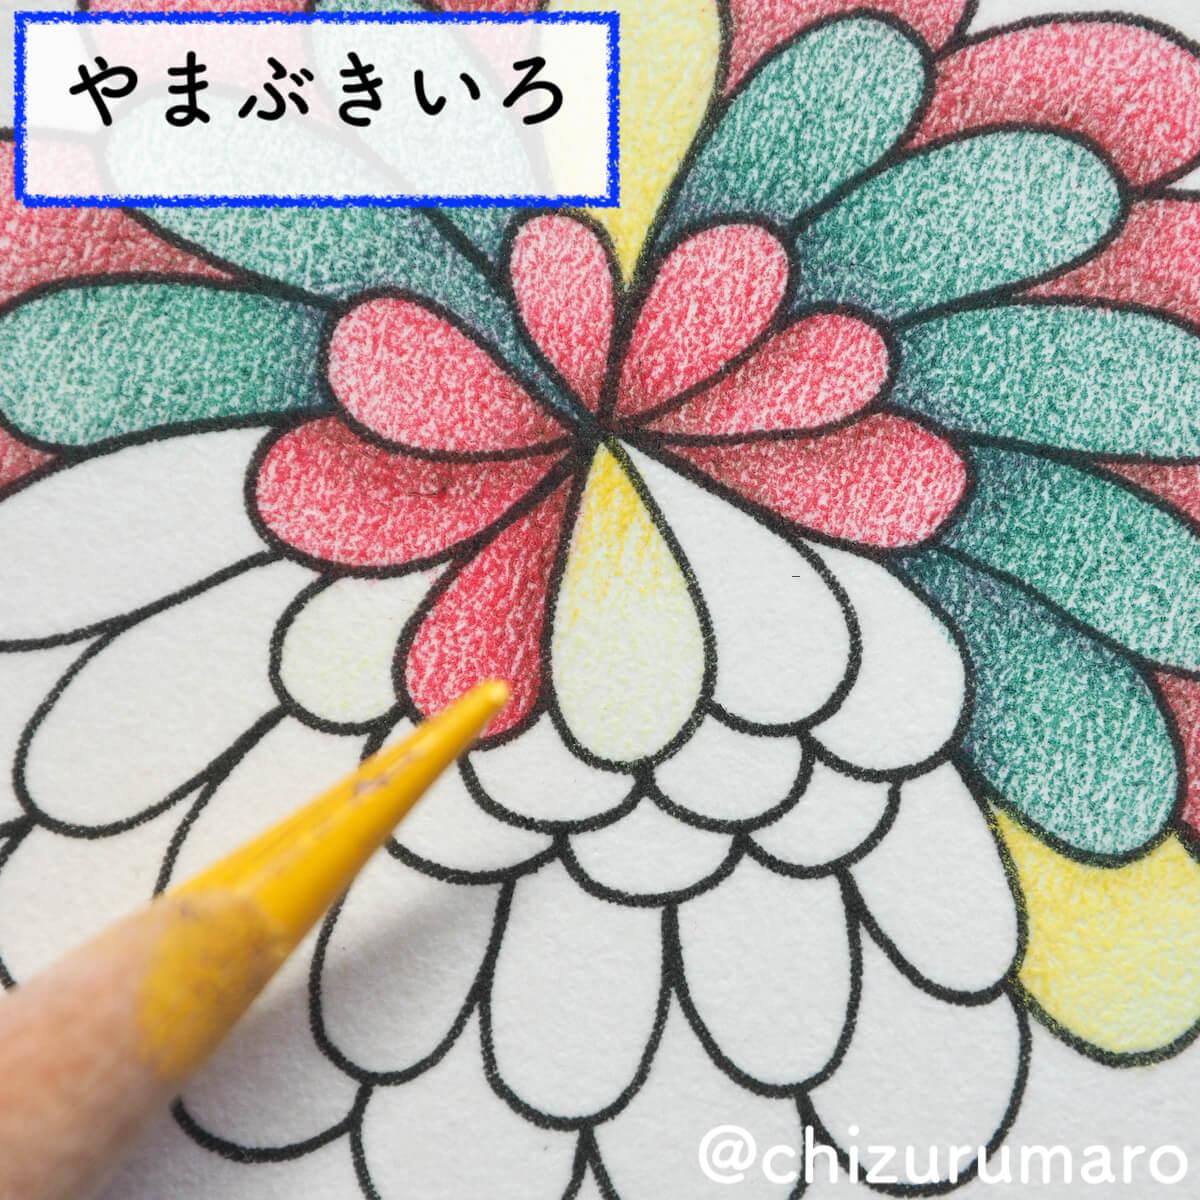 f:id:chizurumaro:20200511125056j:plain